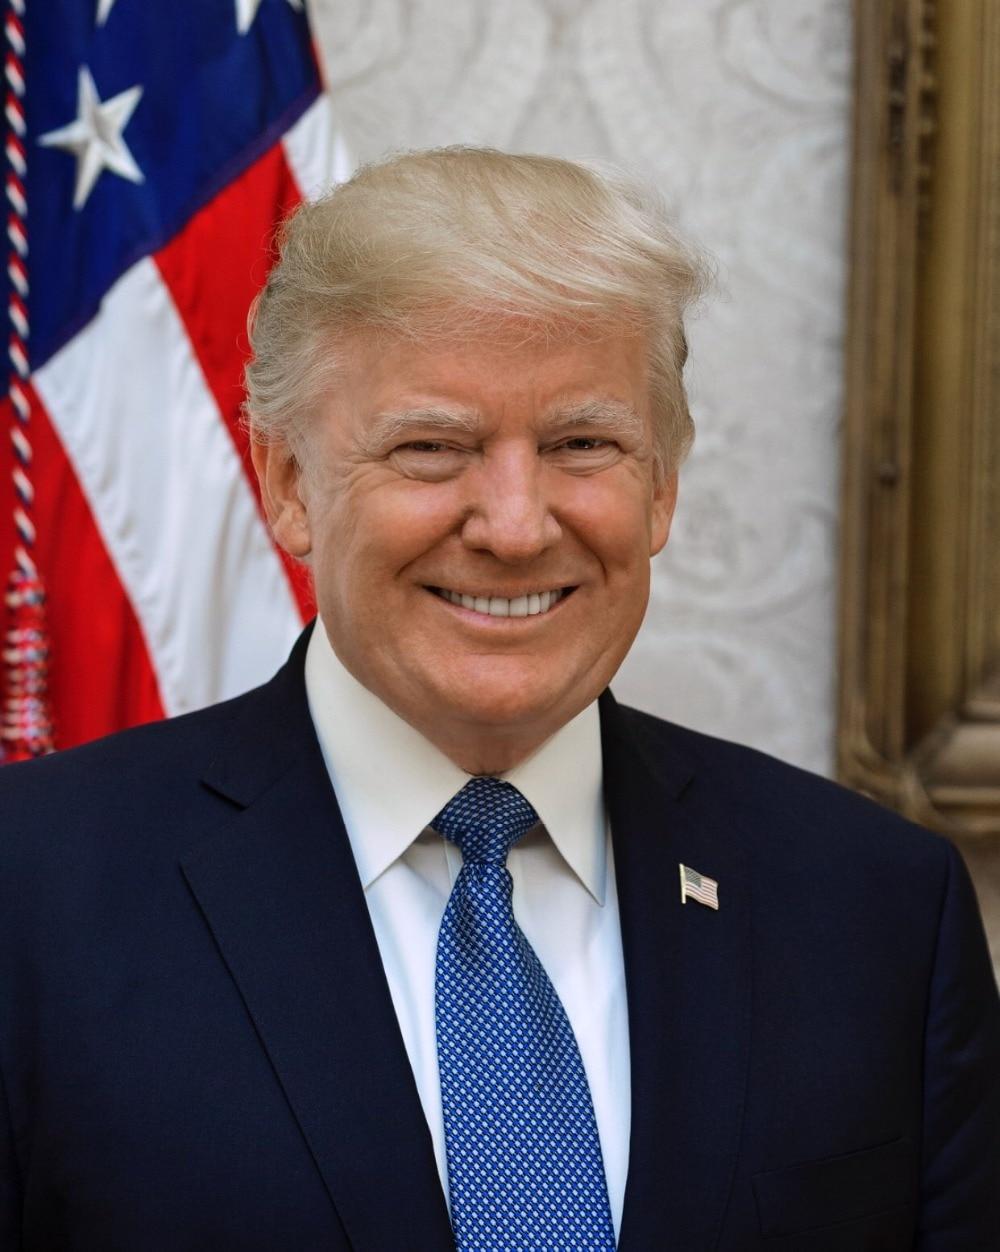 Full Square/Round Diamond Diamond Embroidery US President Donald Trump 5D DIY Diamond Cross Rhinestone Mosaic Home Decoration